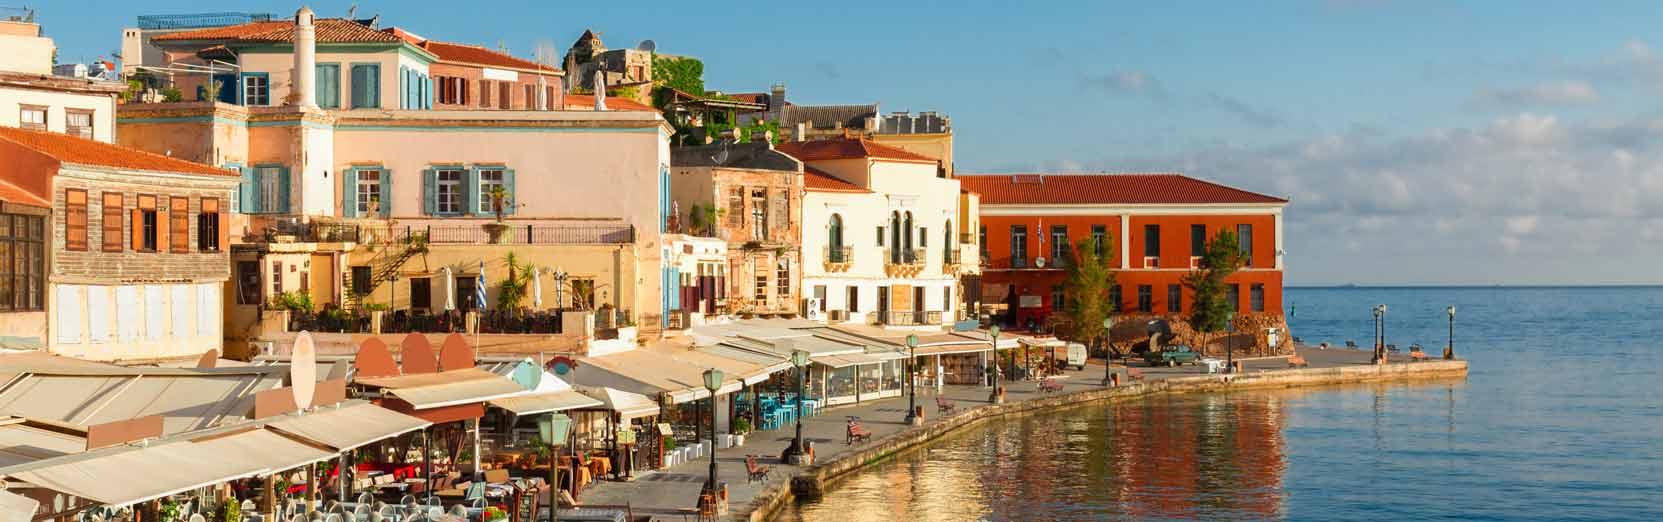 Kreta: Mietwagen ohne Kreditkarte